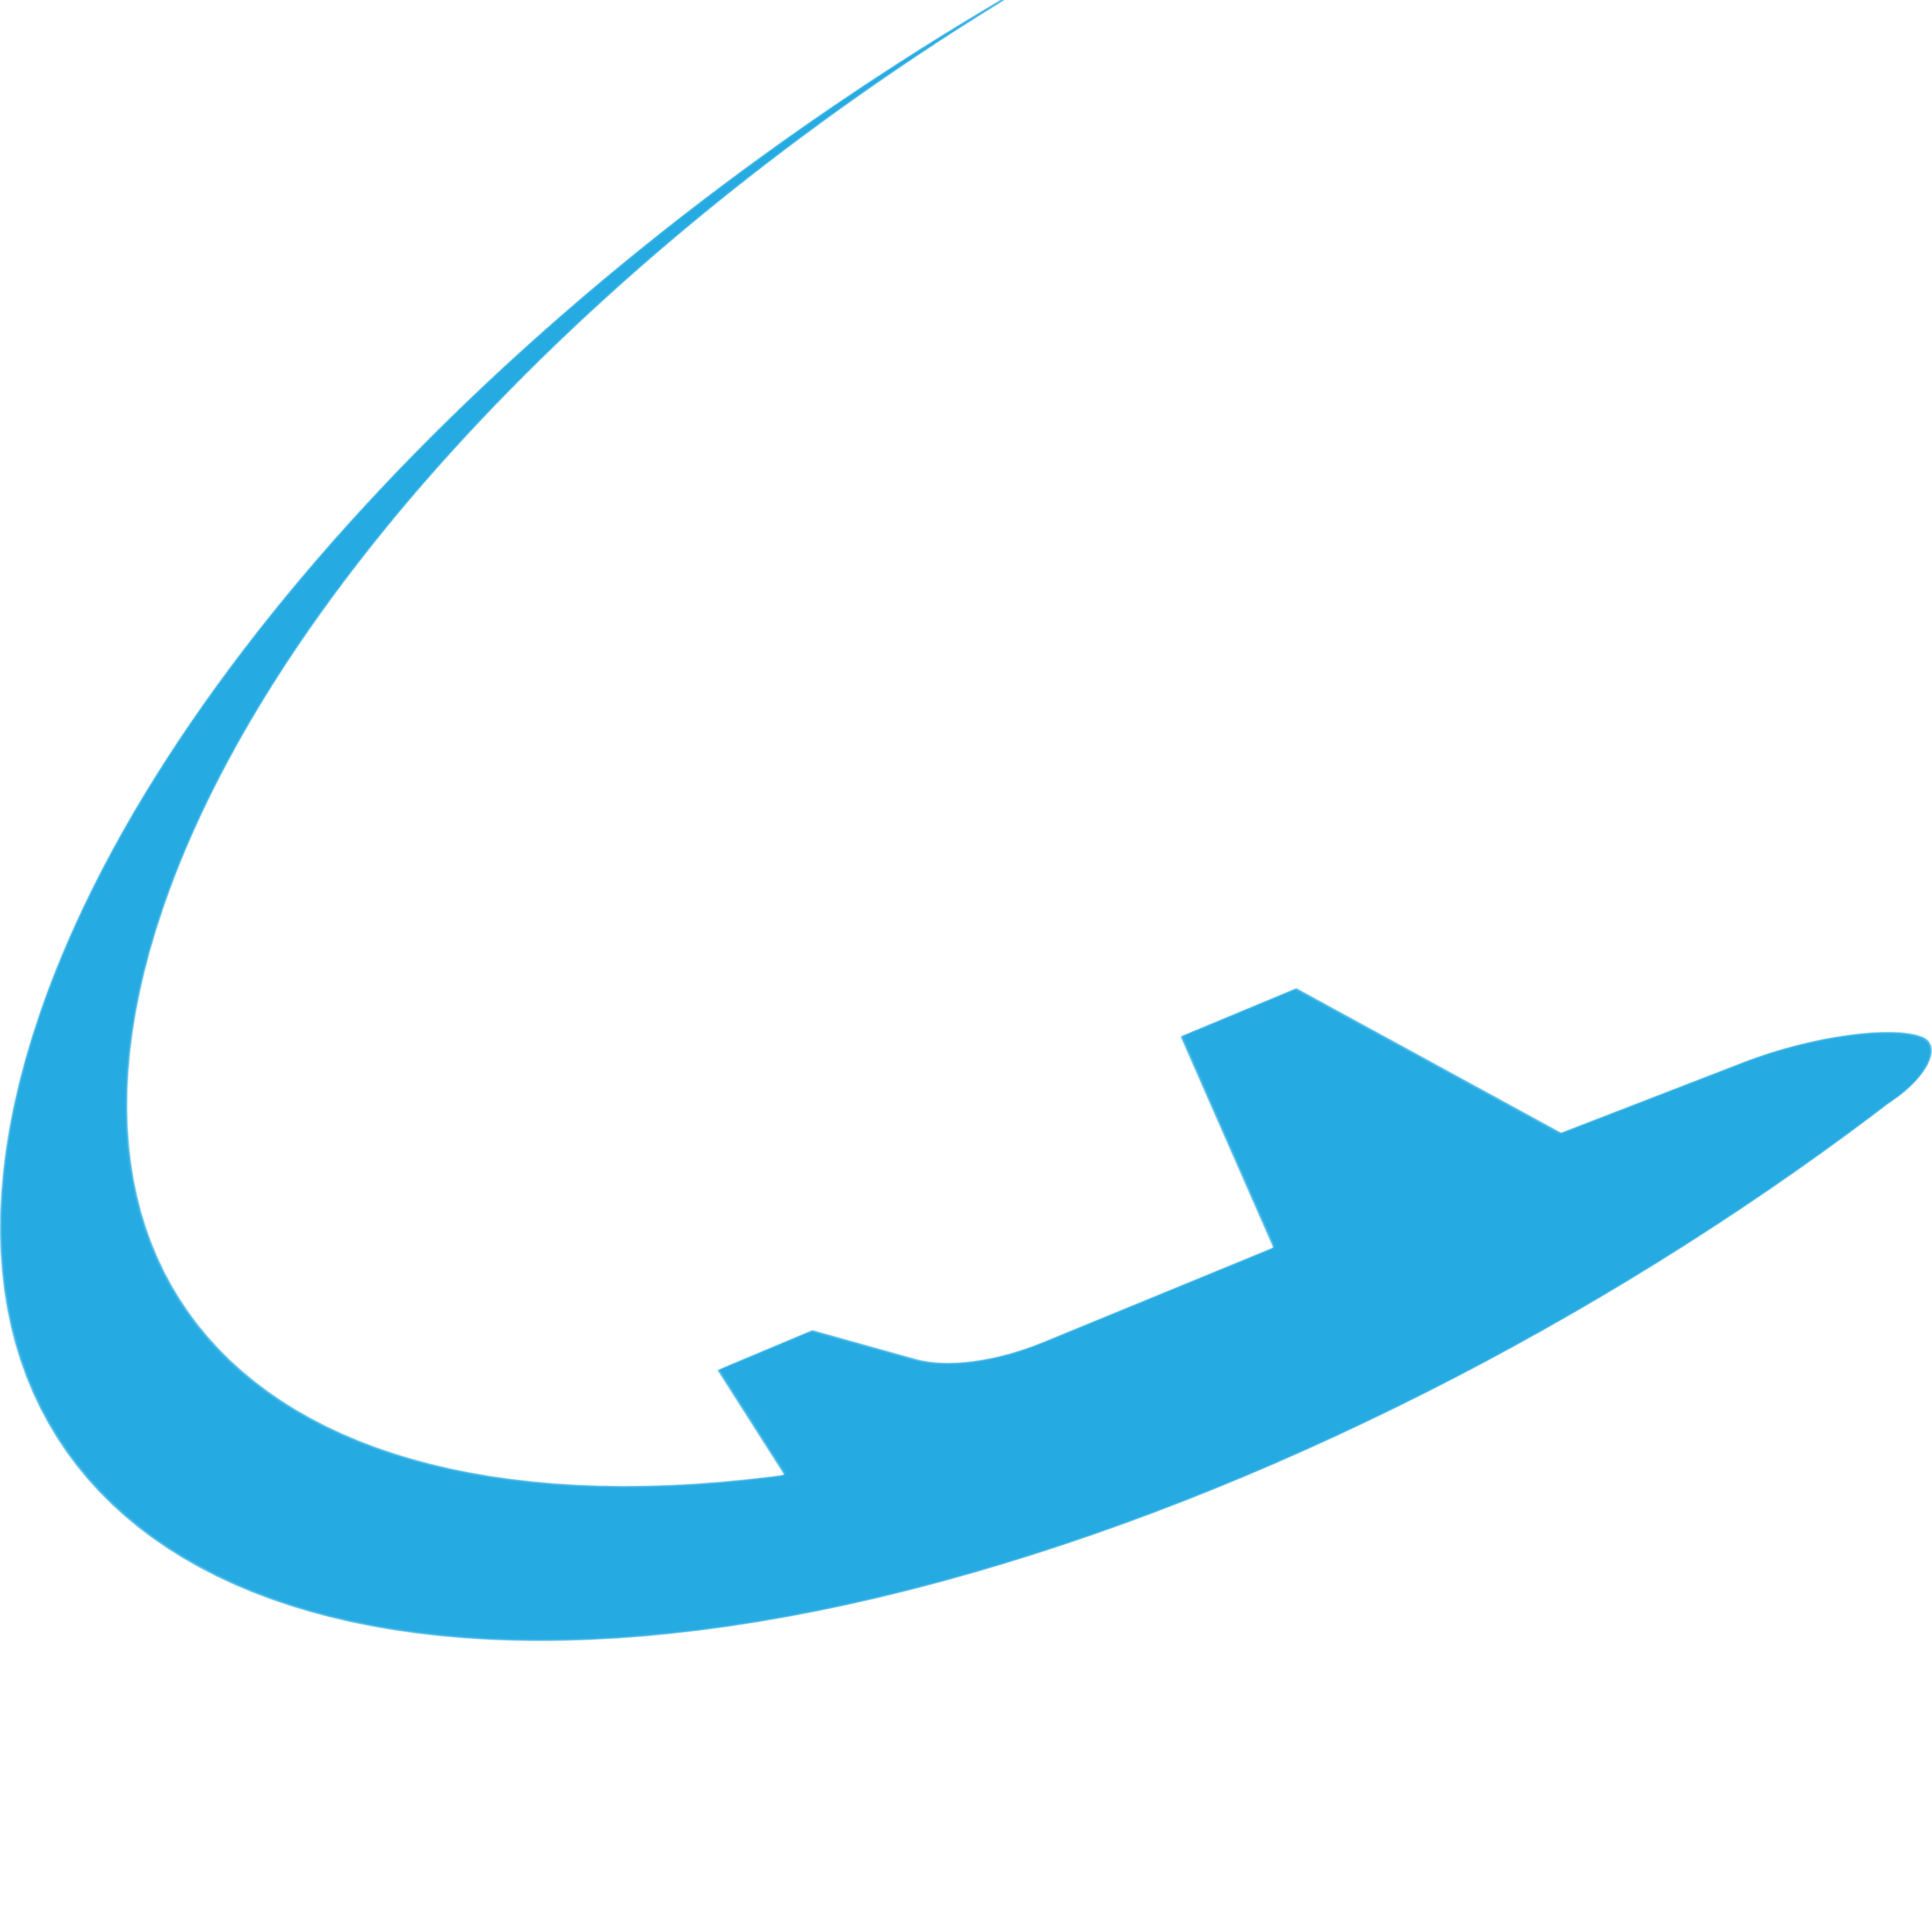 FileWv logo proposal flying plane contortedpng   Wikimedia Commons 3596x3595